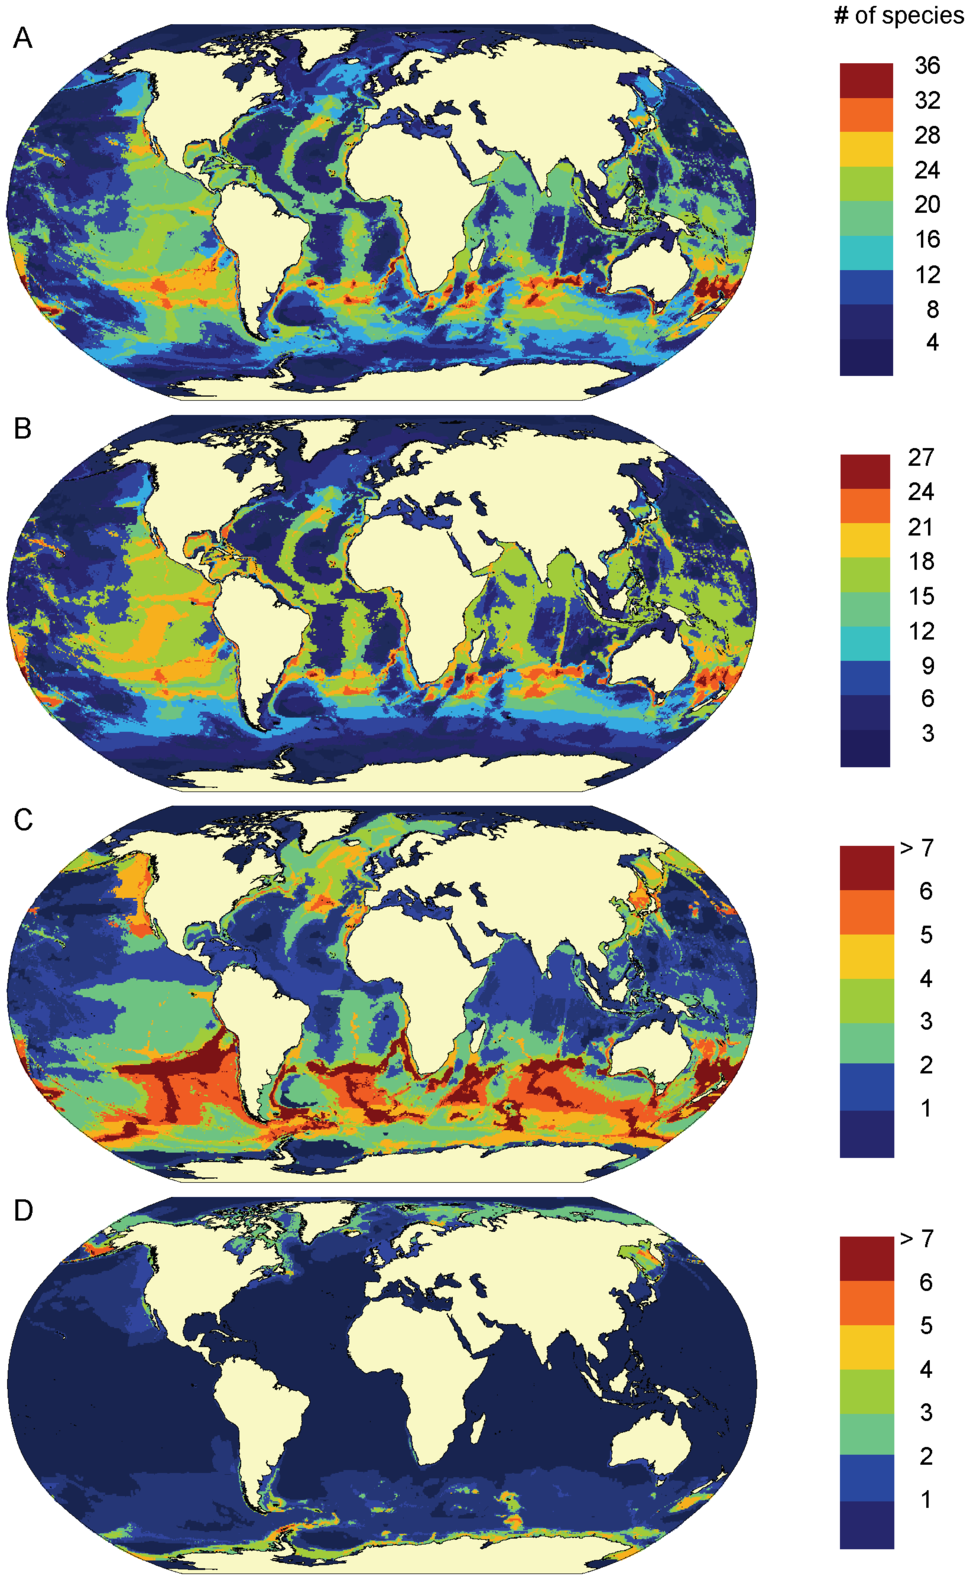 Predicted patterns of marine mammal species richness